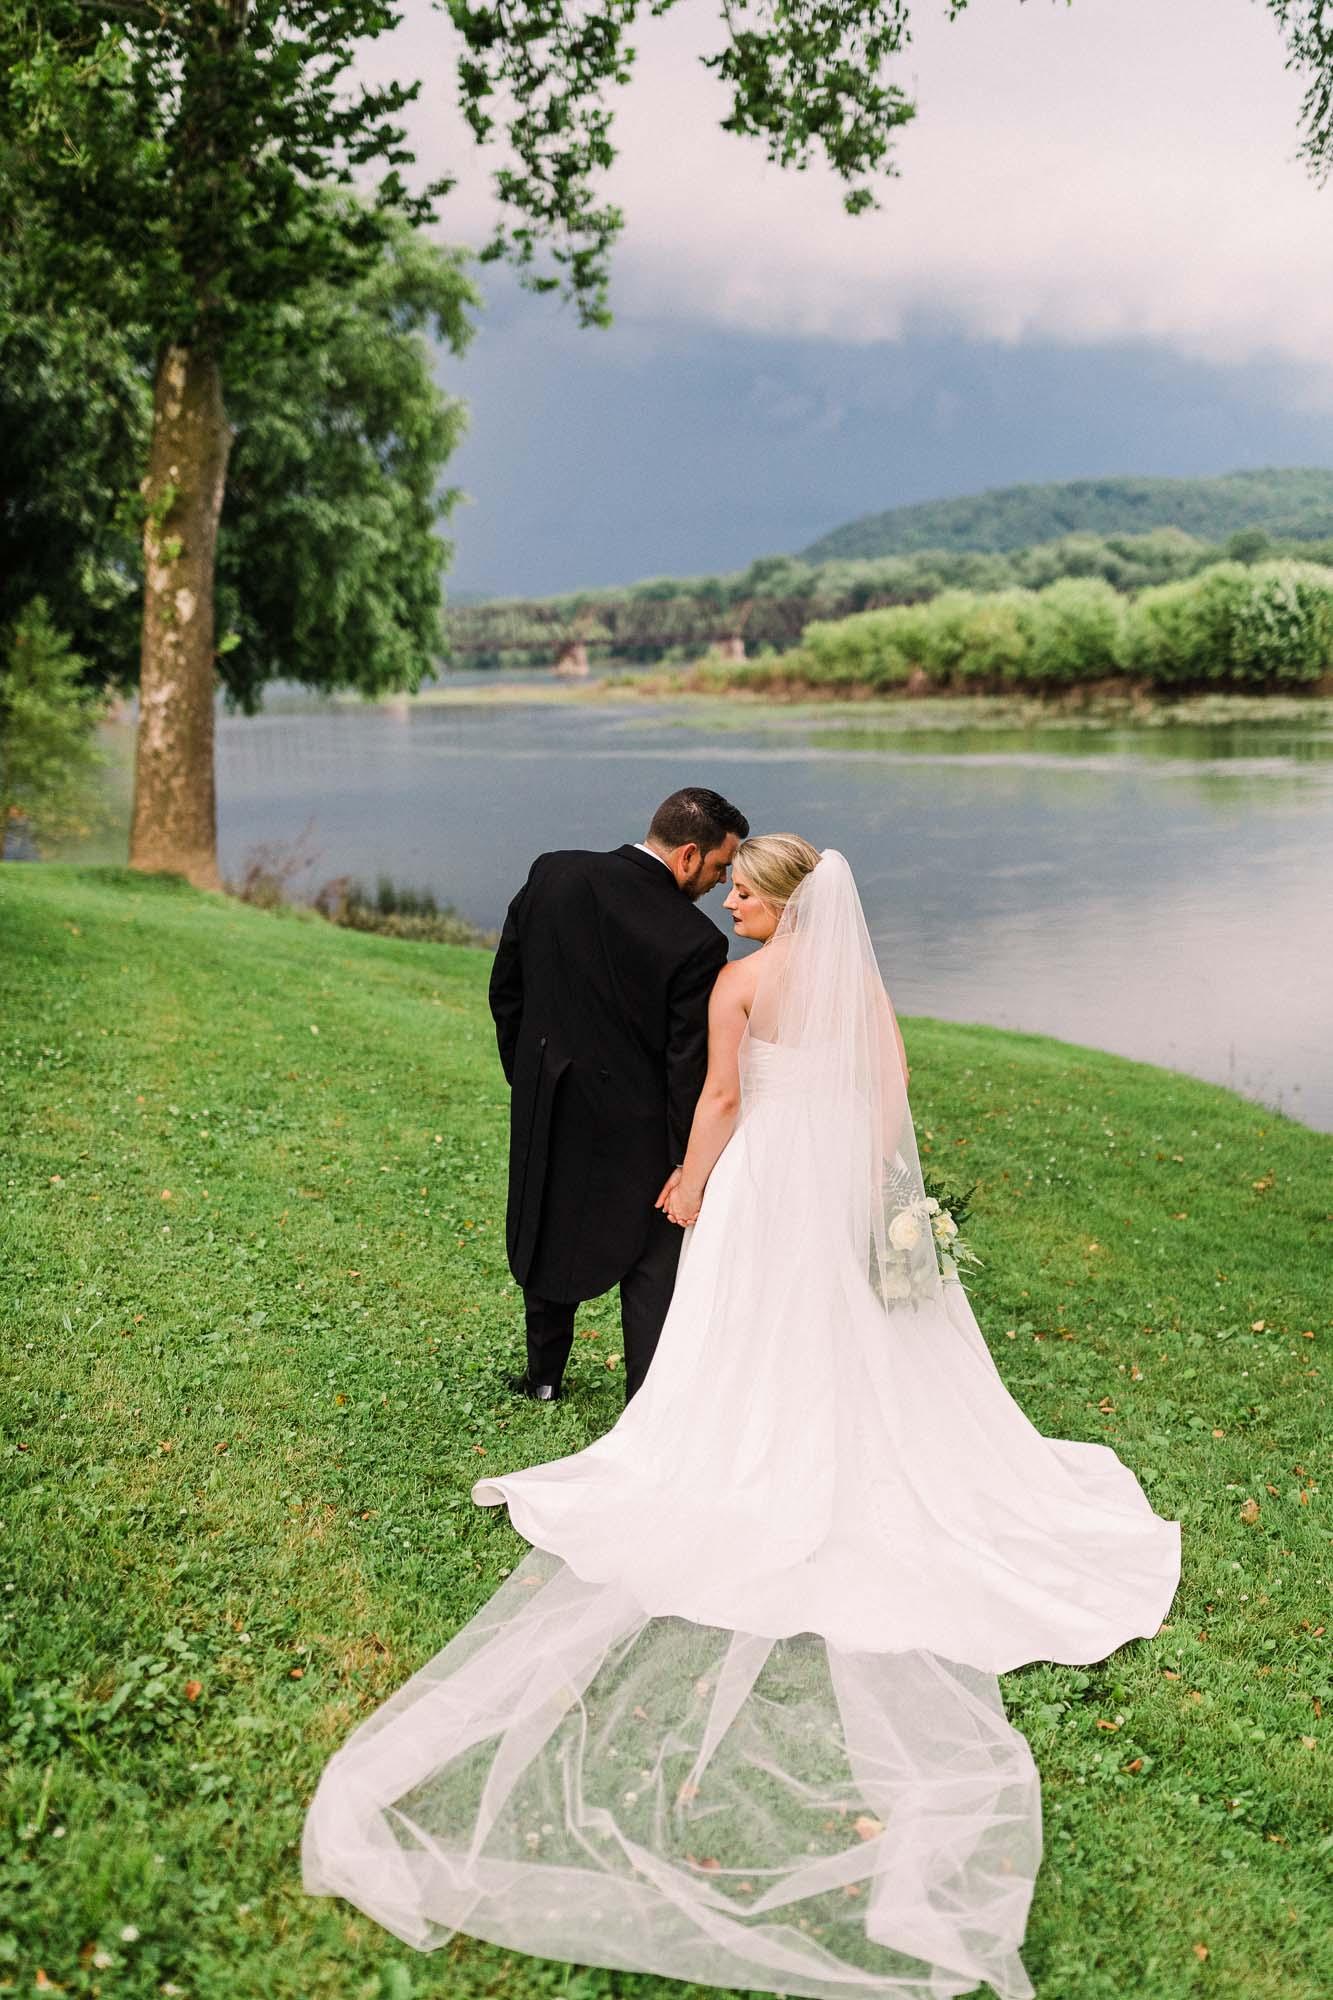 isle-of-que-wedding-6967.jpg